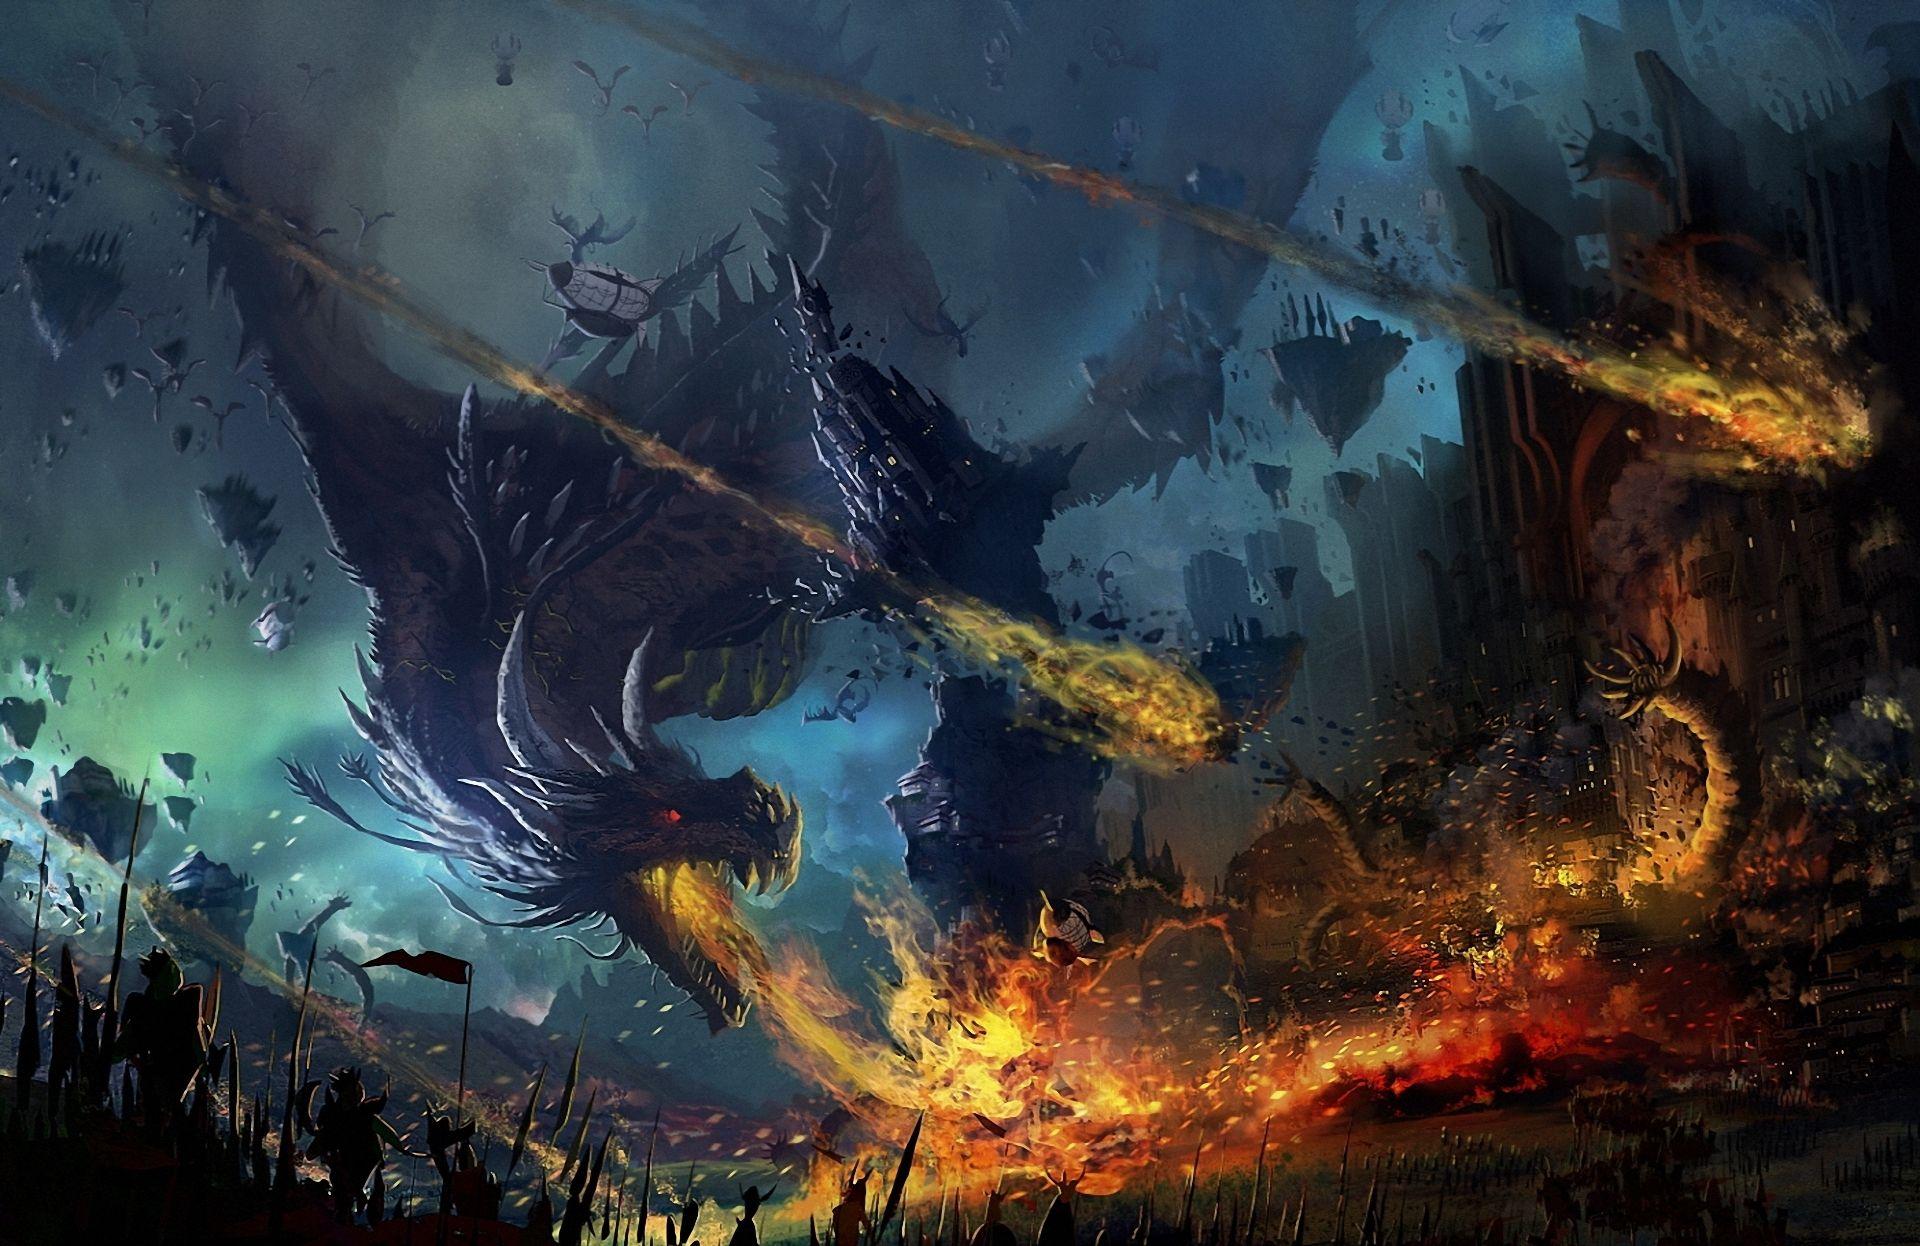 Wallpaper Backgrounds For Kindlefire Kindle Fire Desktop Wallpaper Dragon Fight Fantasy Dragon Fire Dragon